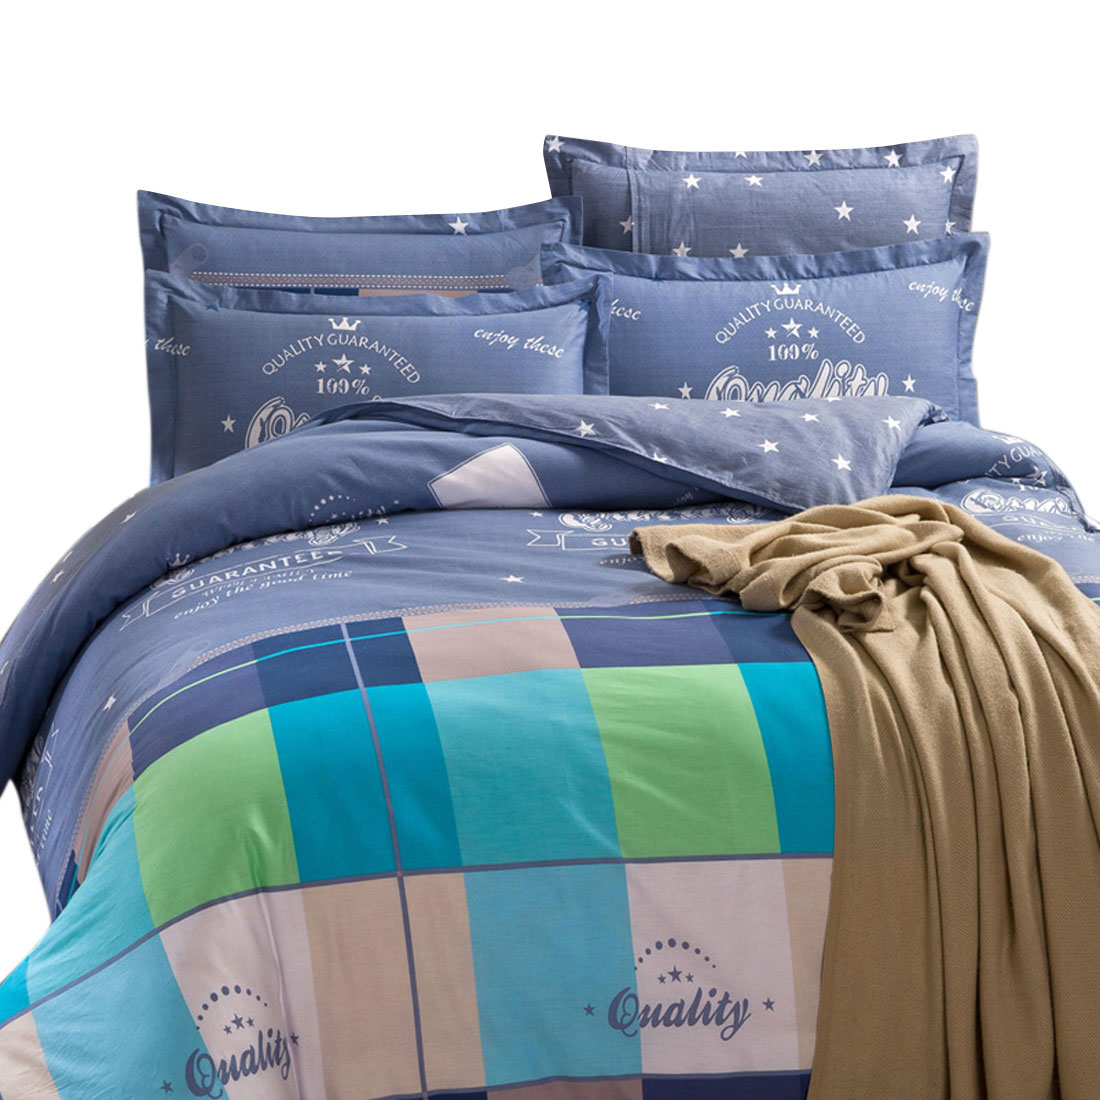 Bedroom Grid Pattern Duvet Quilt Cover Pillowcase Bedding Set King Size